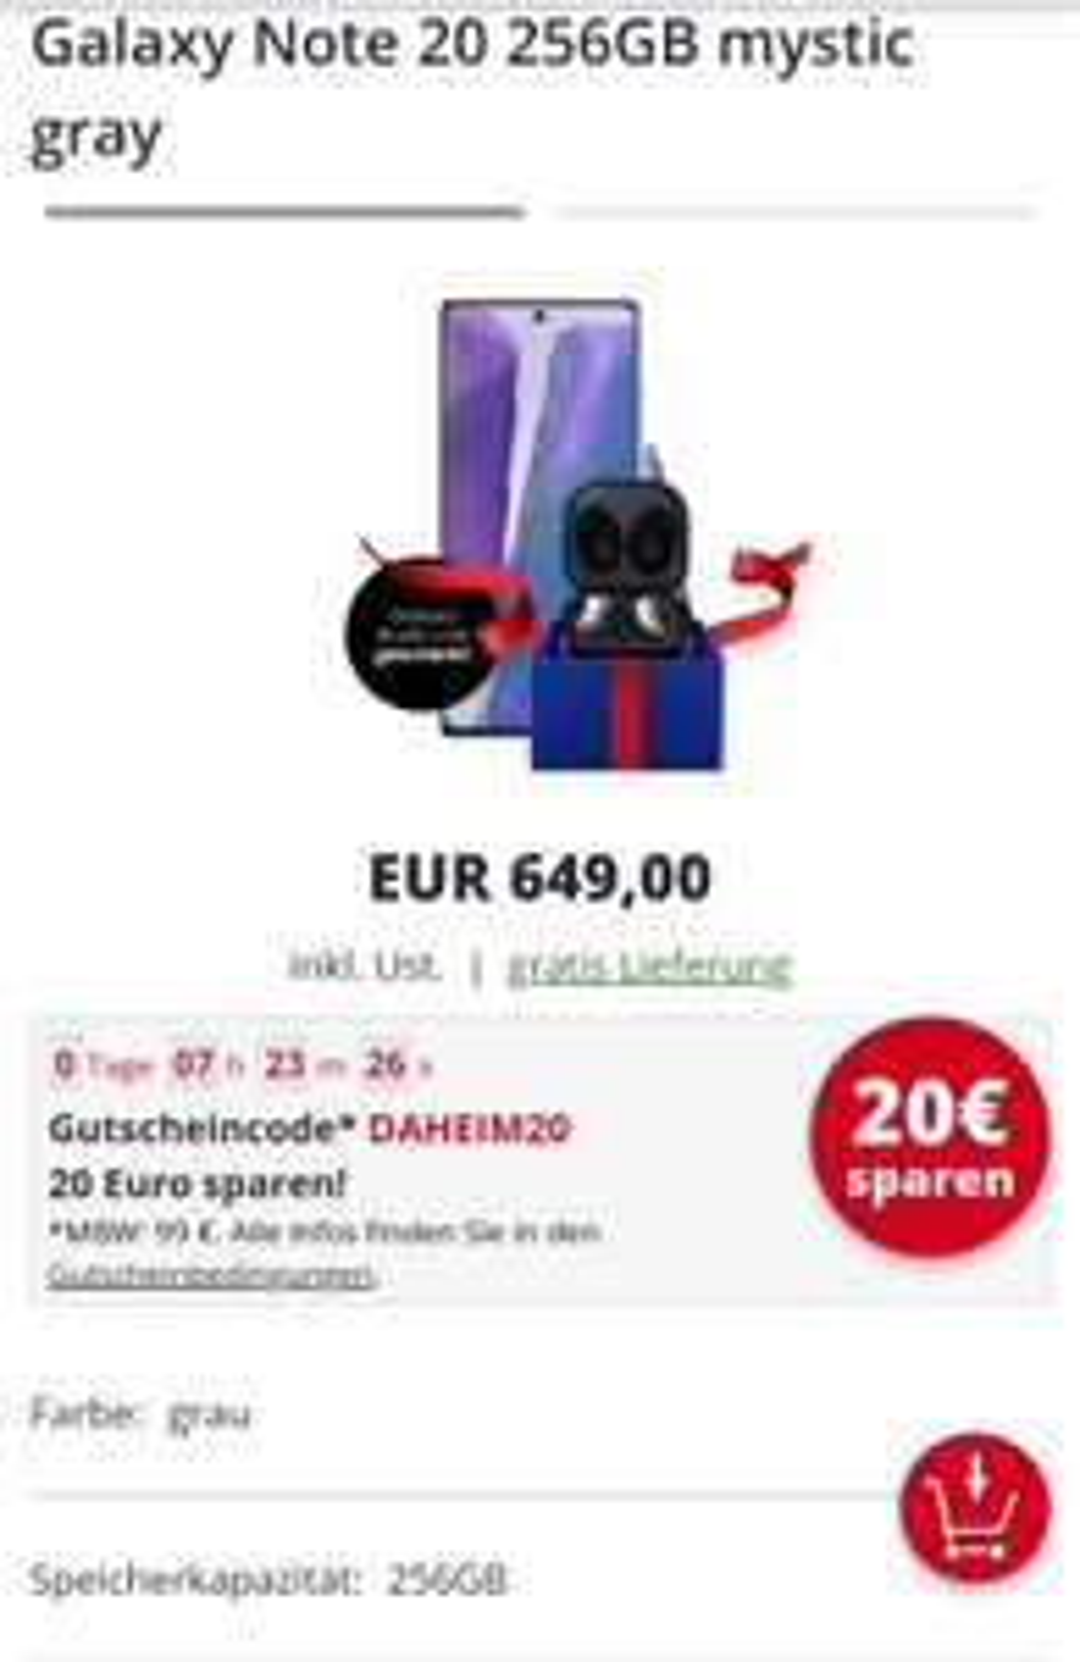 Galaxy Note 20 256GB mystic gray + Galaxy Buds Live gratis